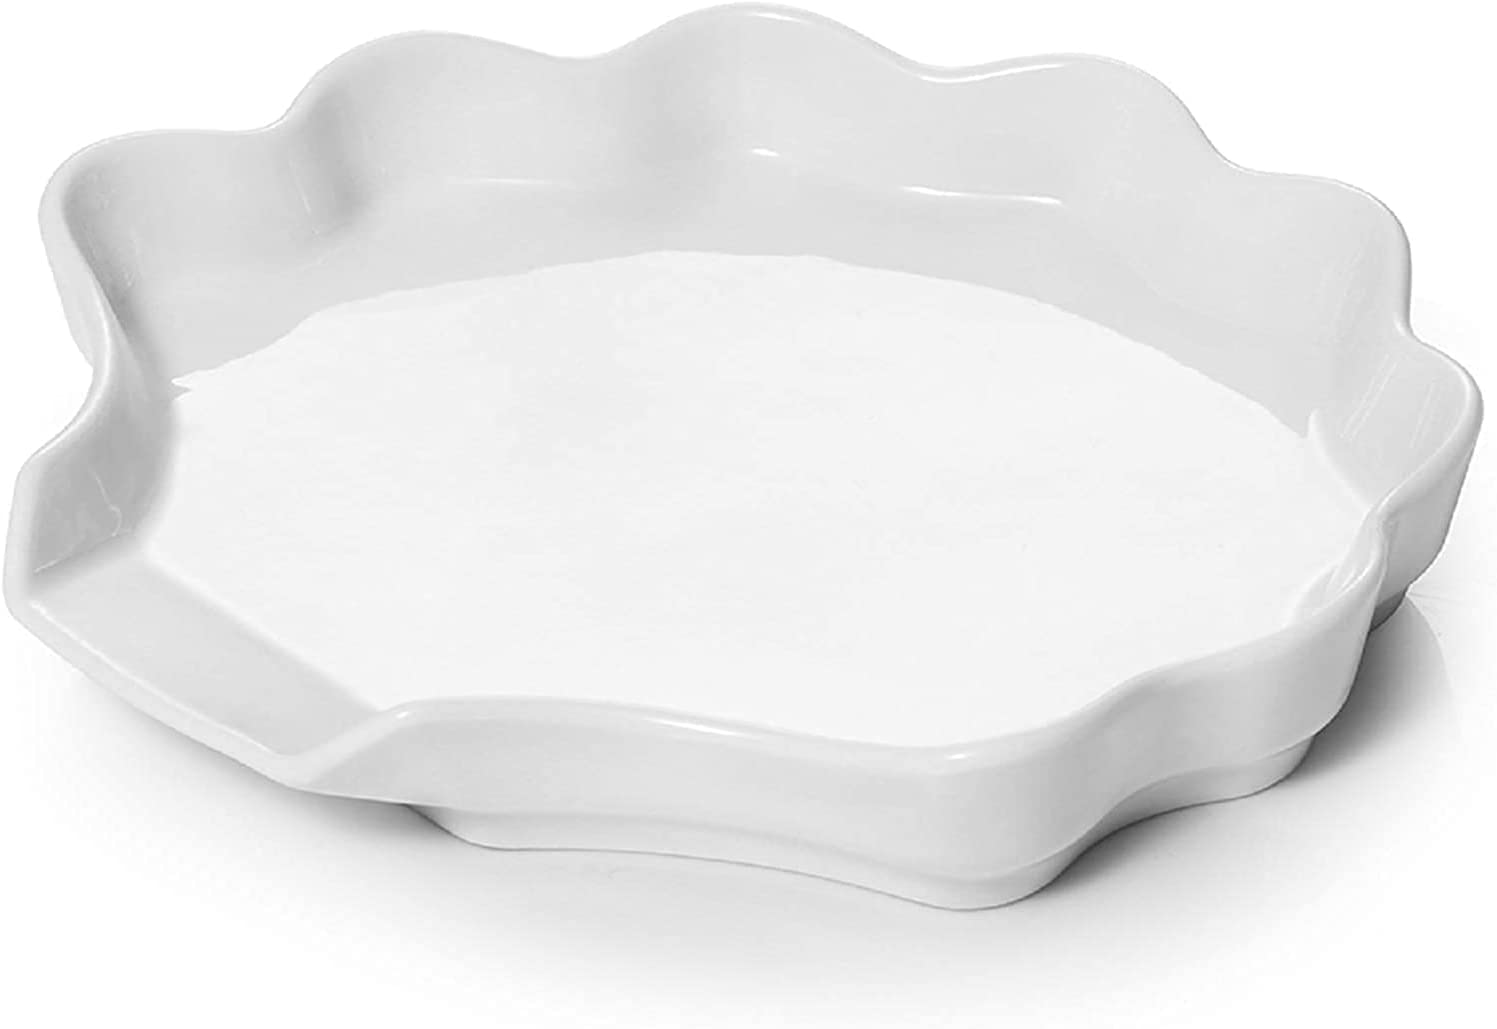 DOWAN discount White Ceramic Spoon Rest Kitchen for Miami Mall S Counter Dishwasher